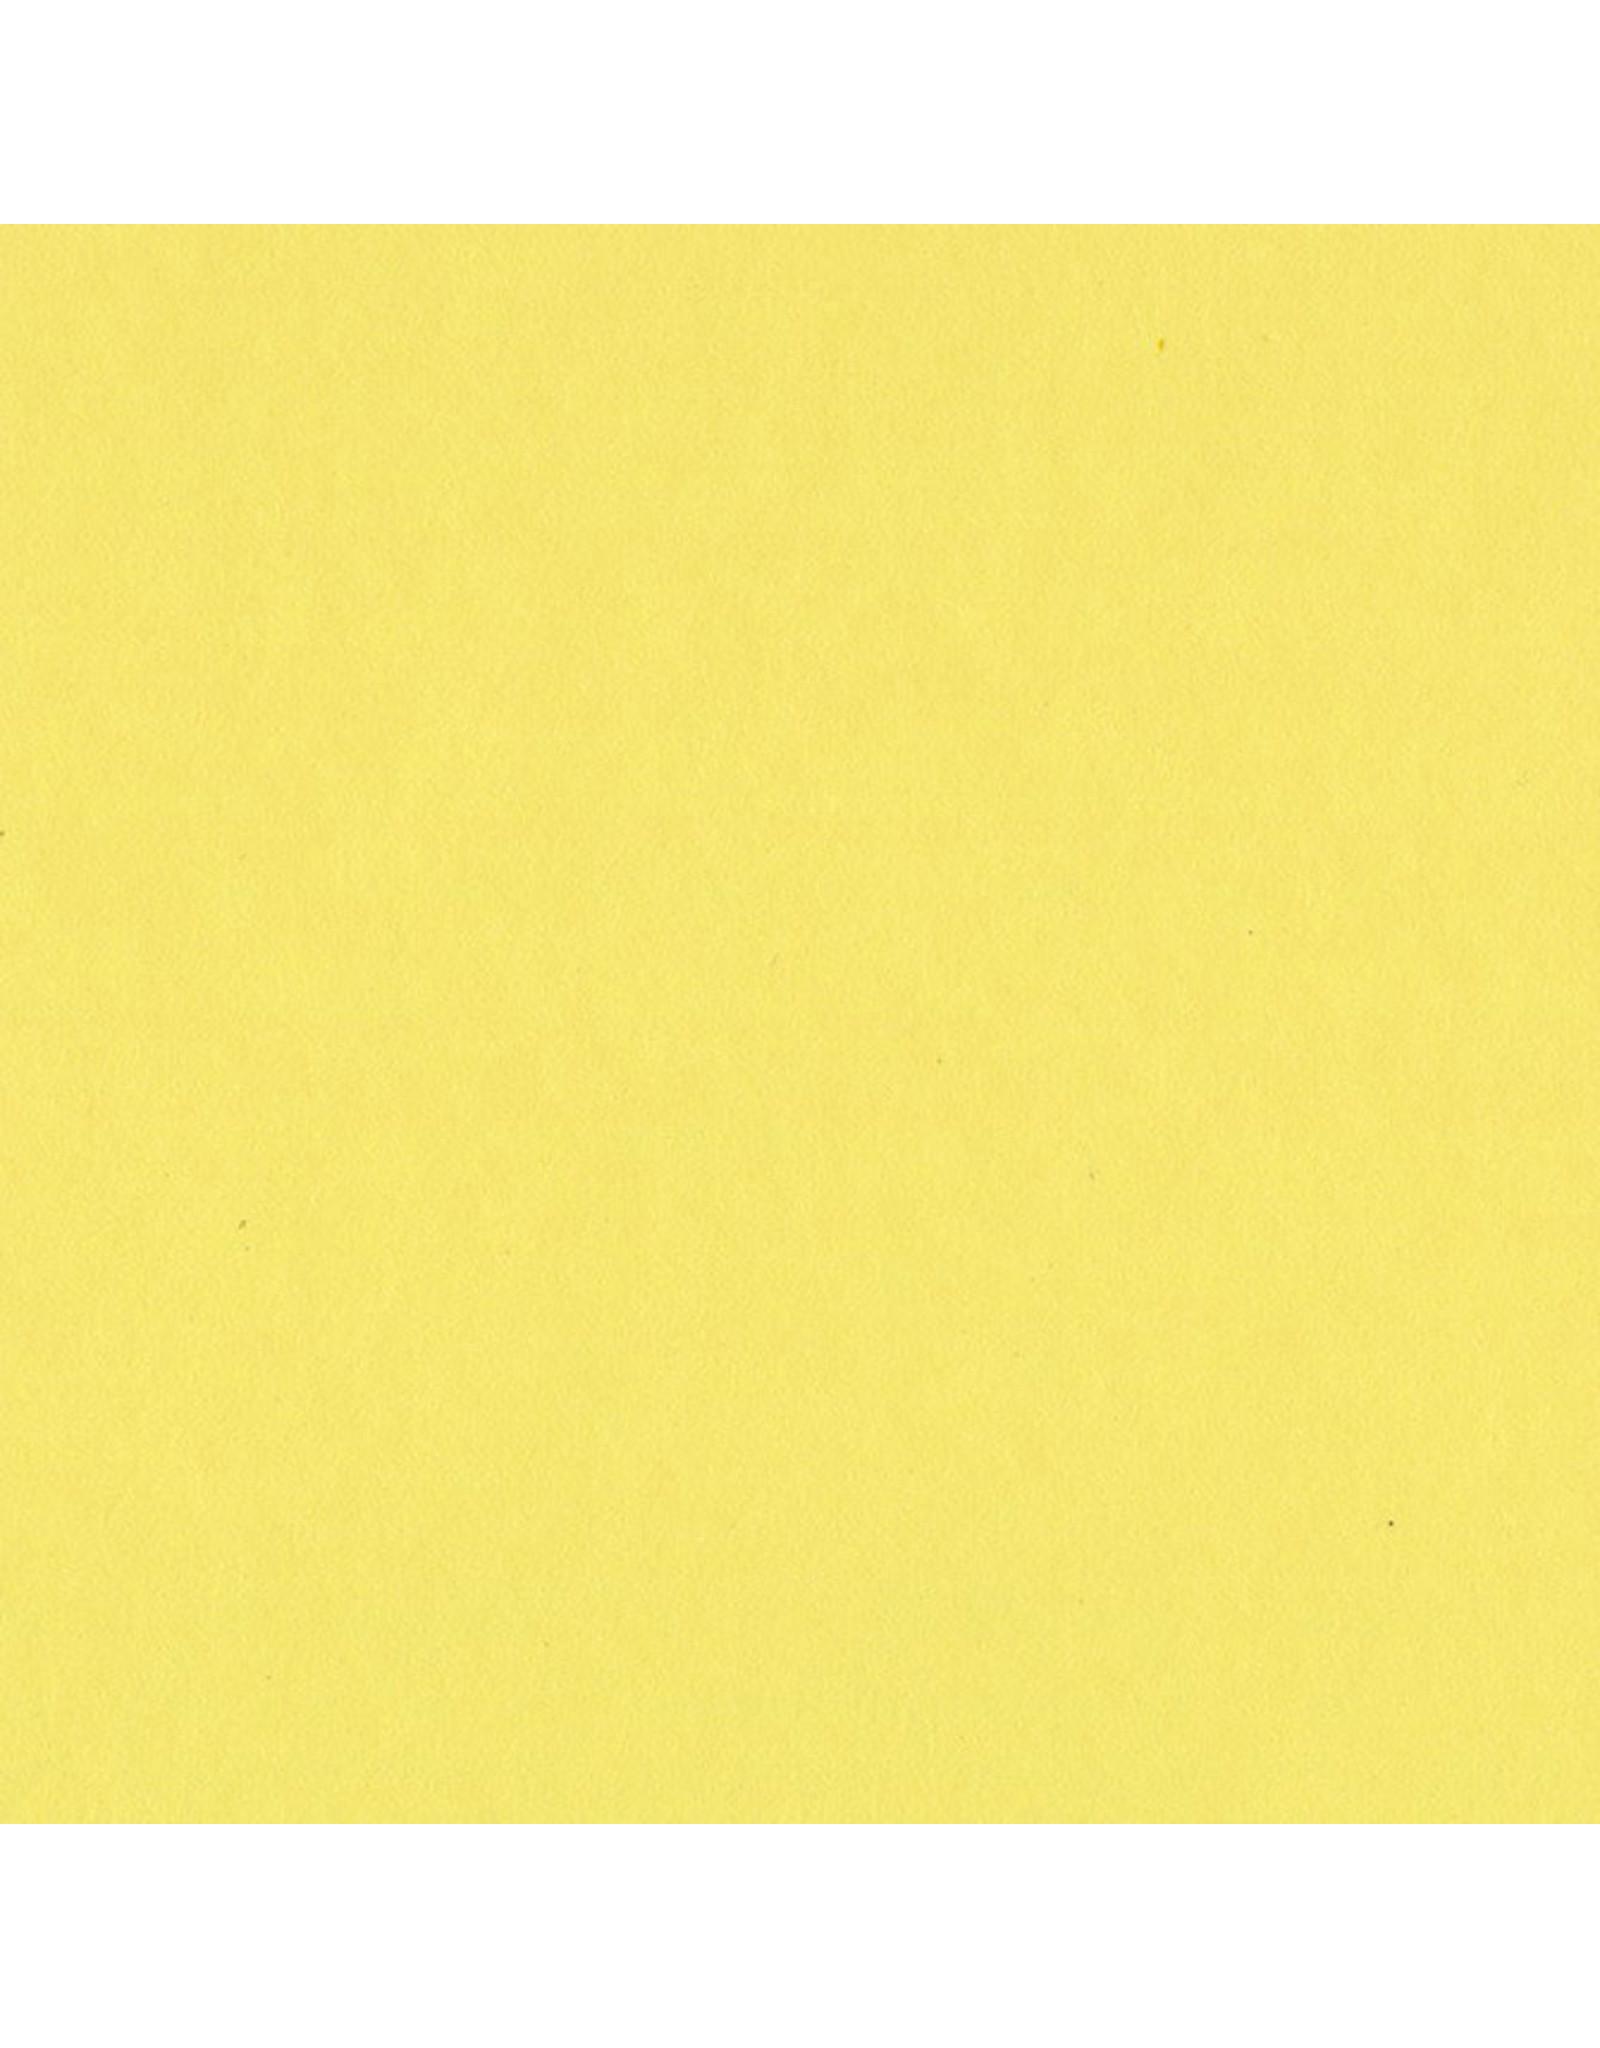 Bazzill Bazzill Card Shoppe 8.5x11 -  Sour Lemon